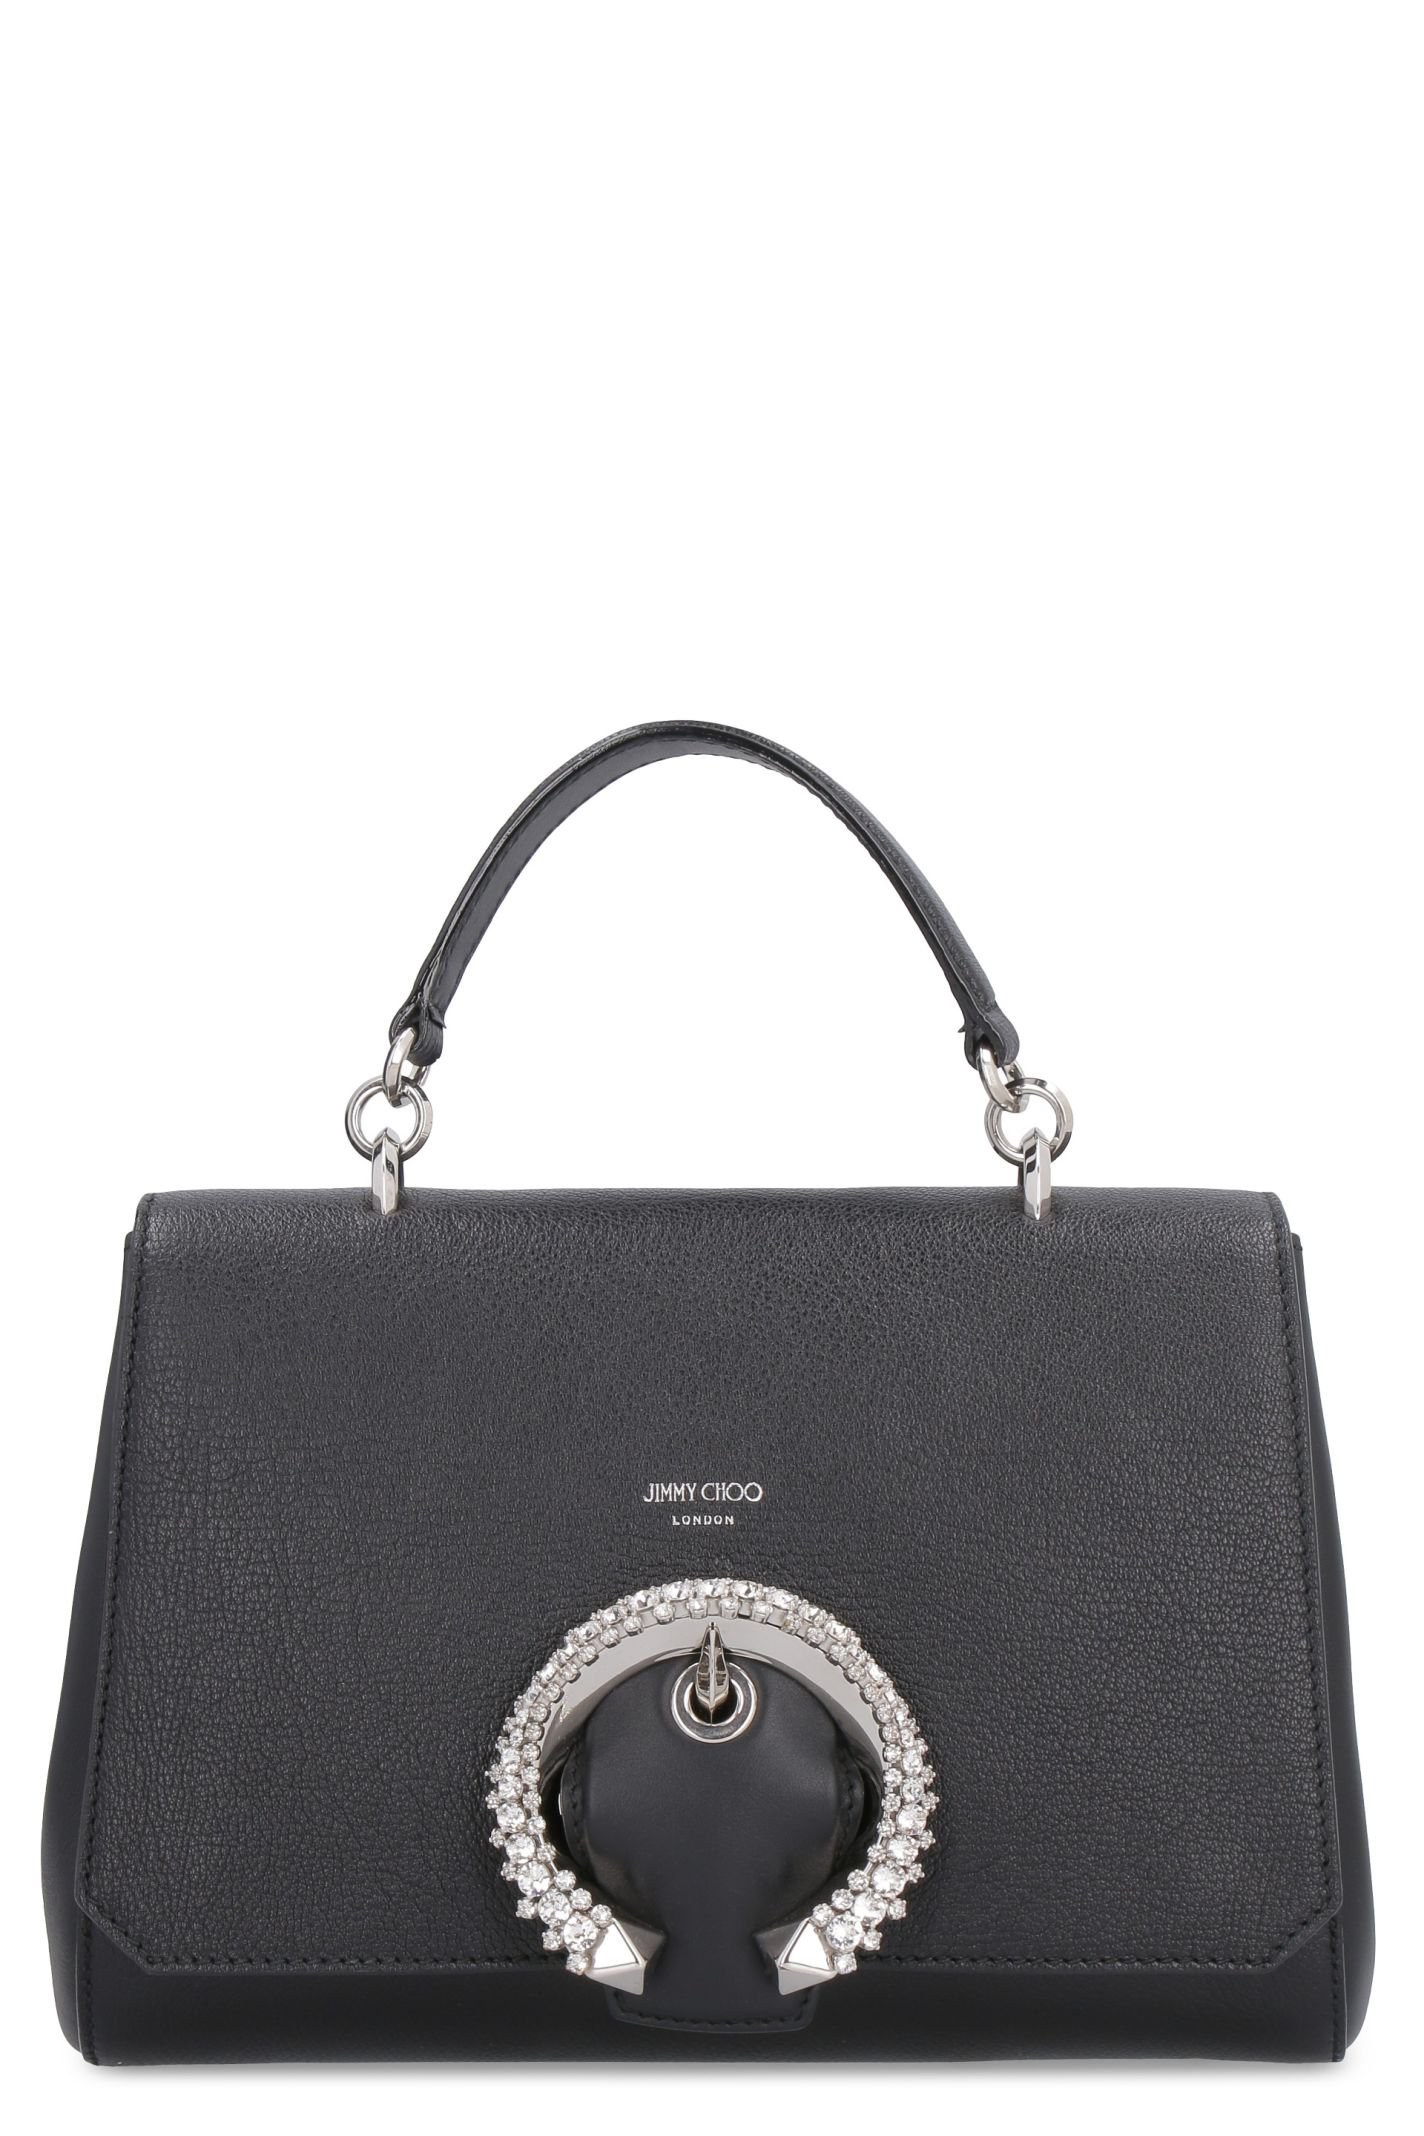 Jimmy Choo Madeline Leather Handbag